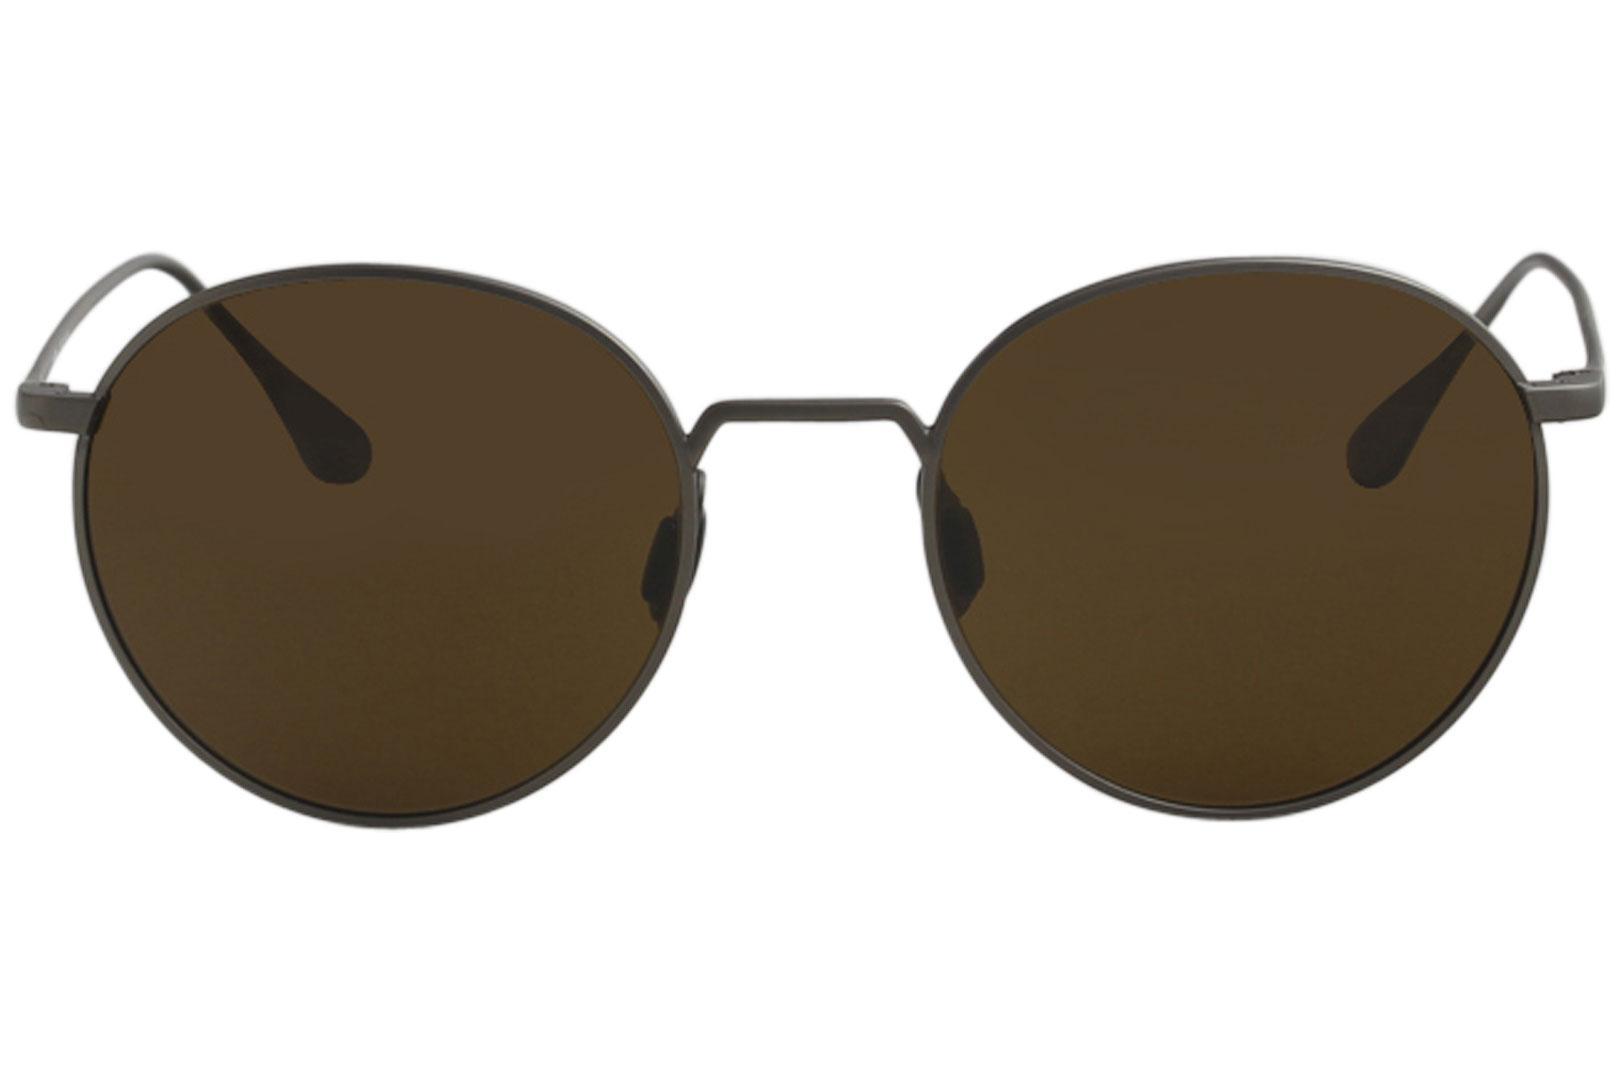 60a7fadb104 Vuarnet Men s Swing Round VL1610 VL 1610 Fashion Titanium Sunglasses